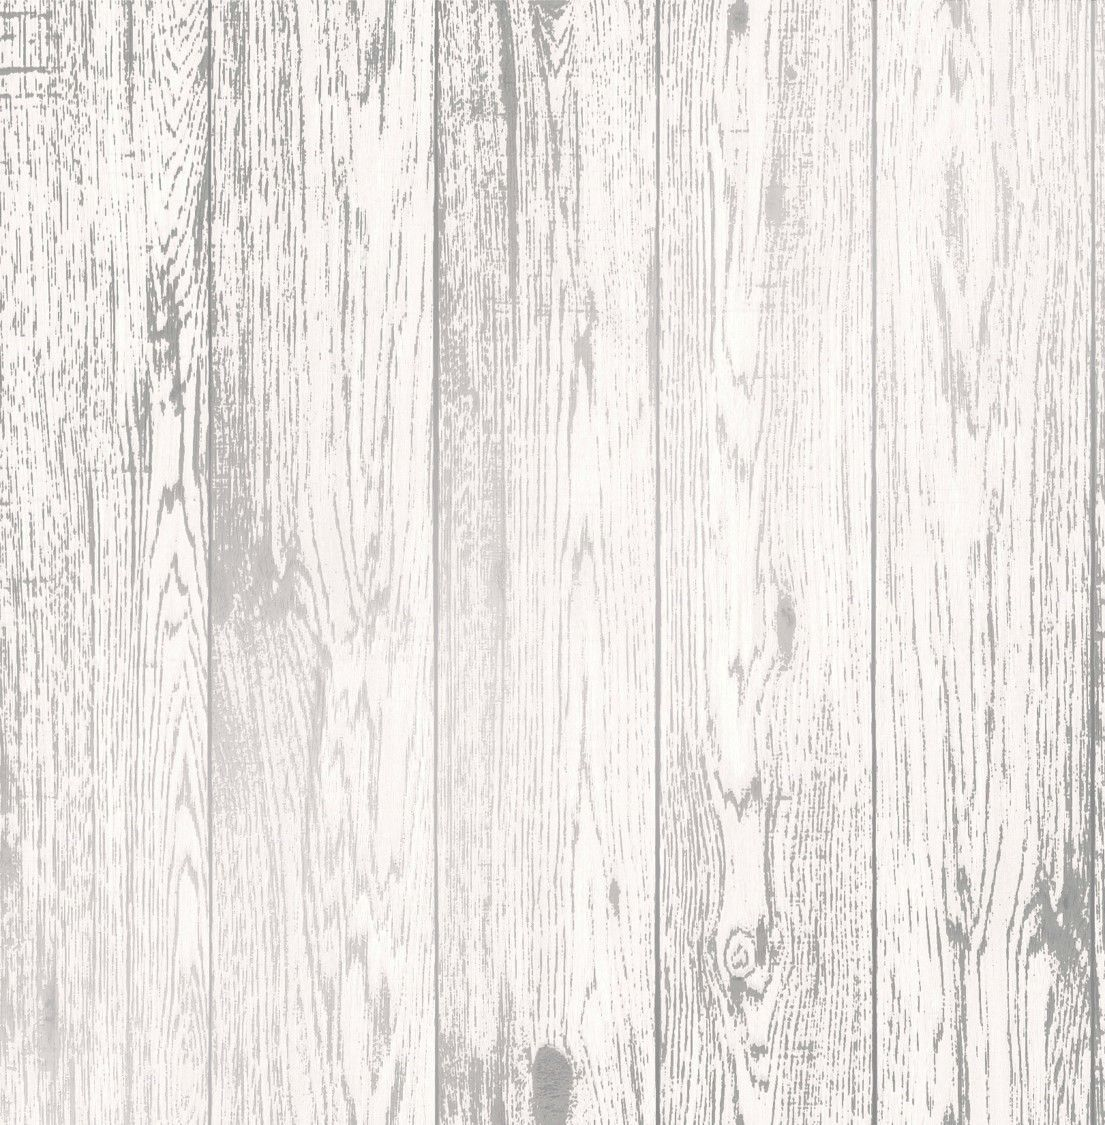 Wood Effect Wallpaper Distressed Wooden Grain Loft Wood